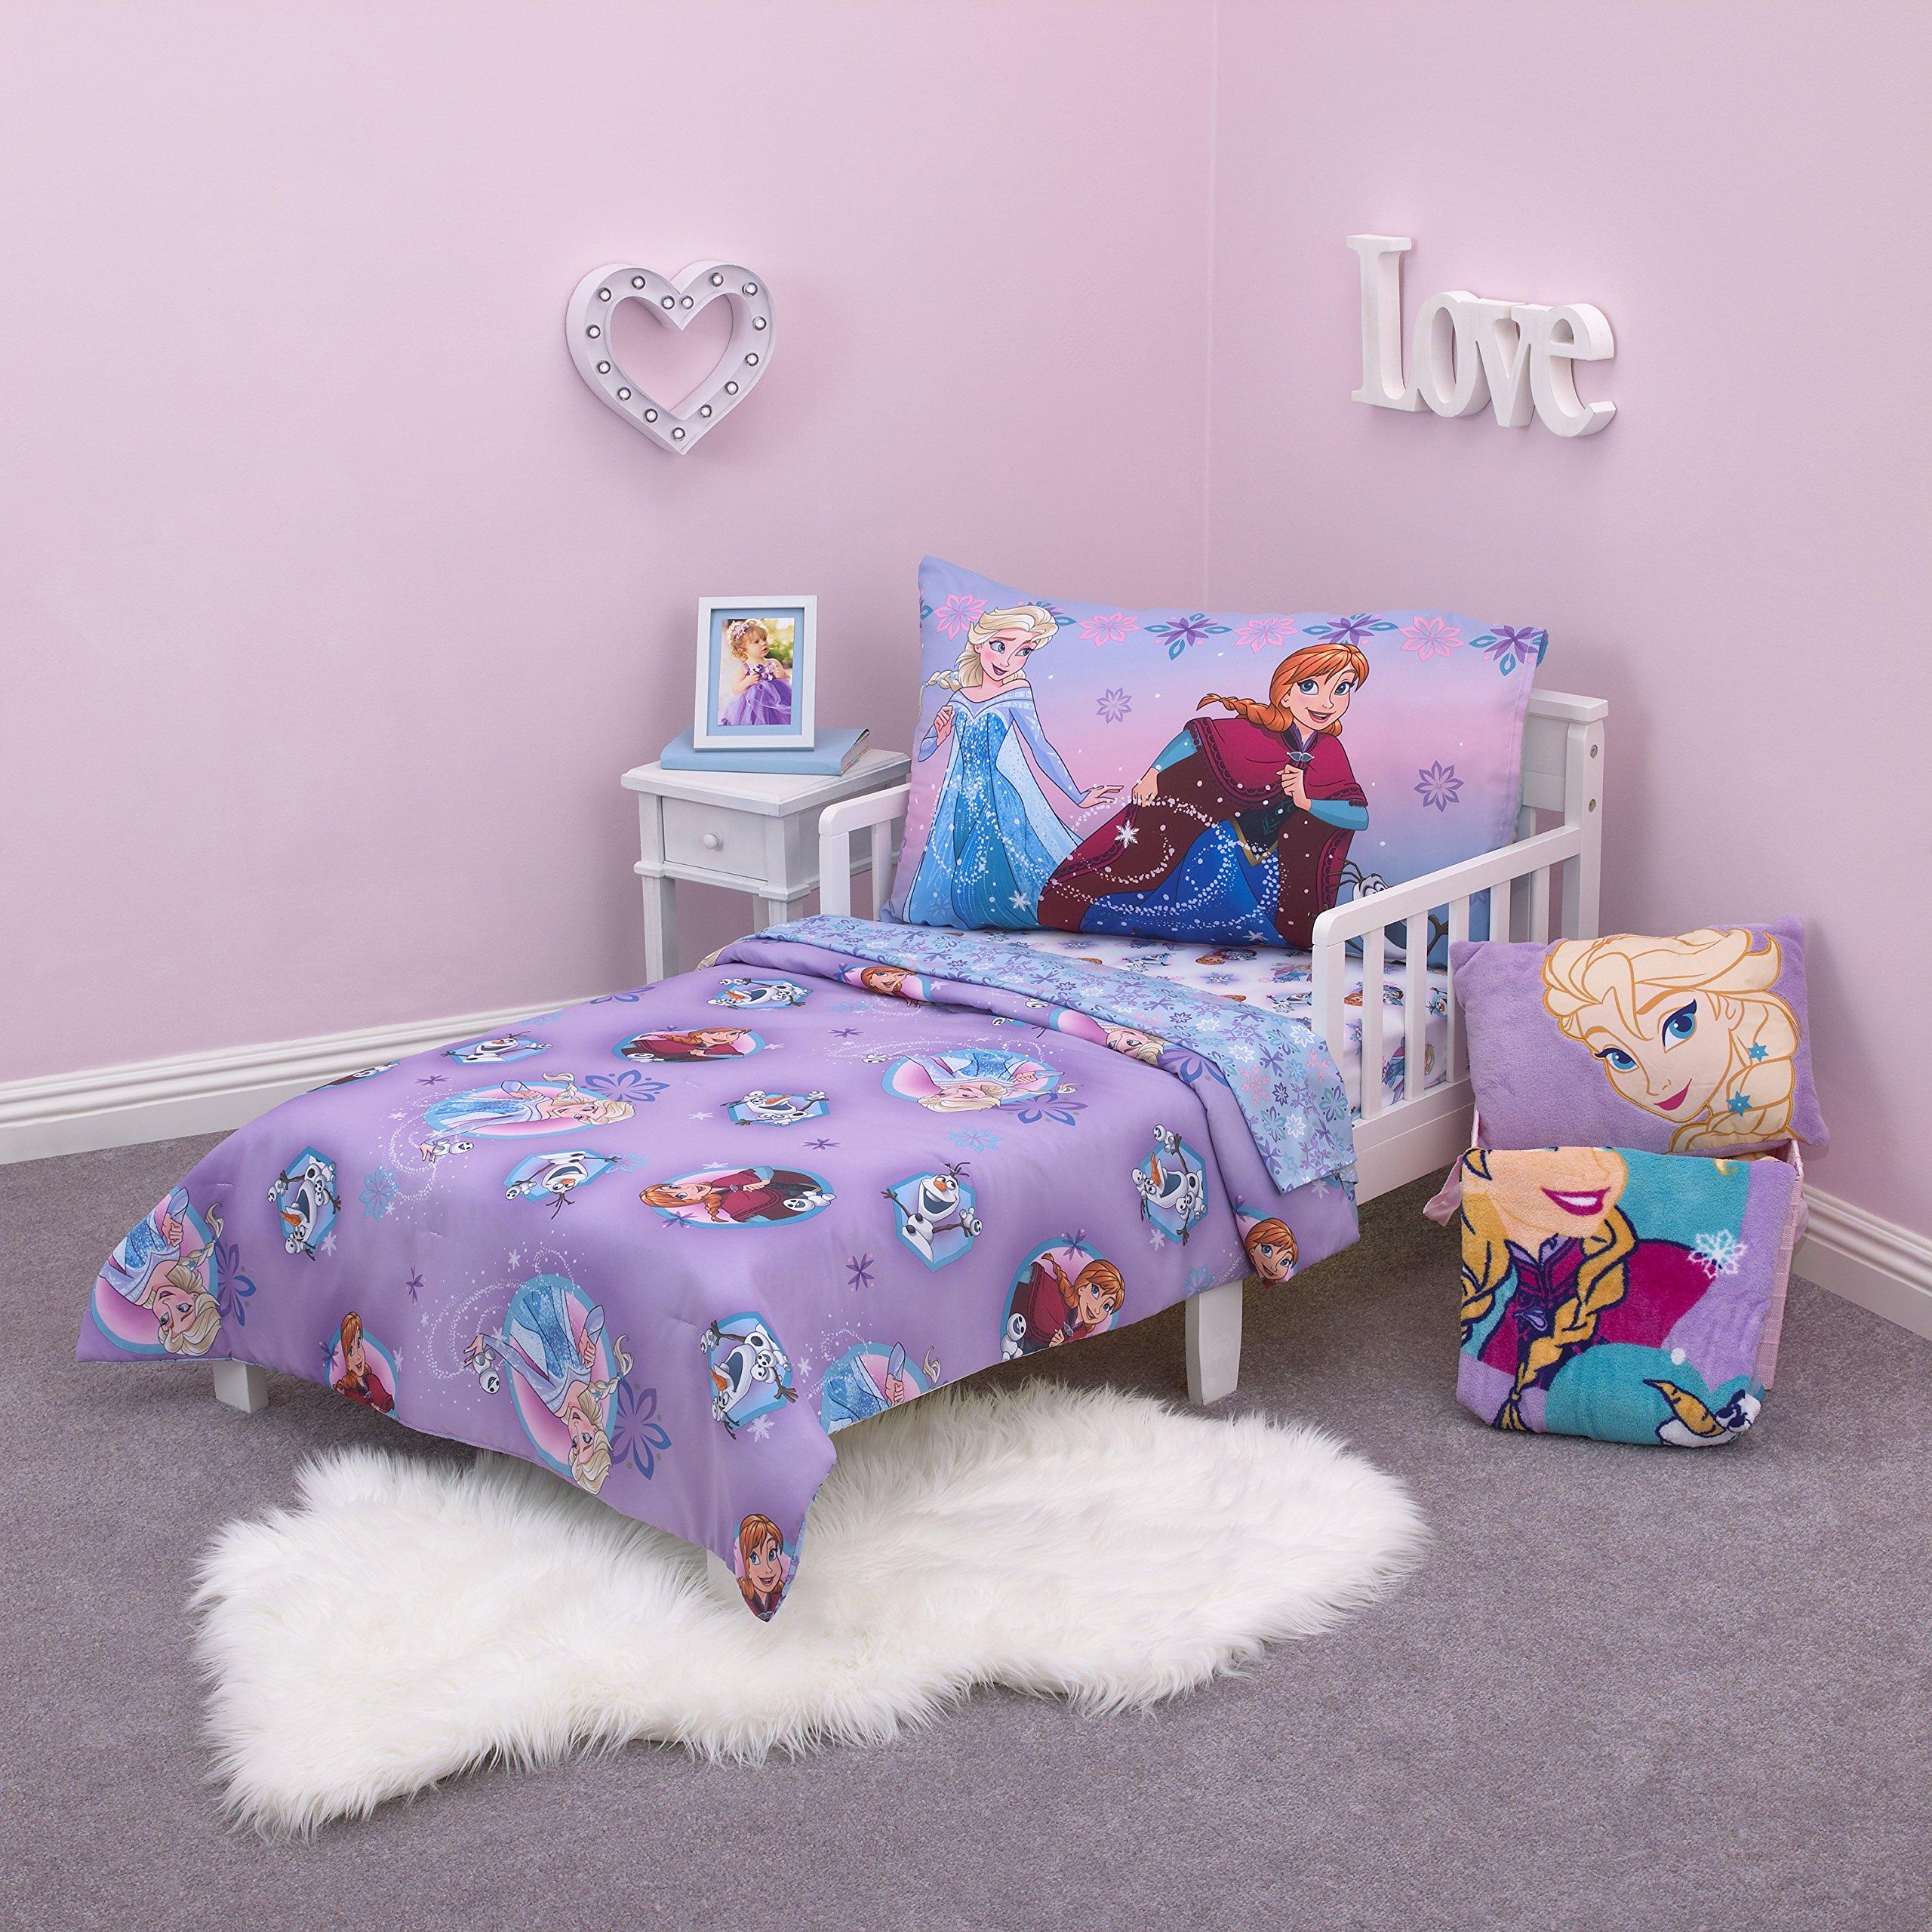 Disney Frozen Stirring Up Fun 4 Piece Toddler Bedding Set, Purple/Pink/Multicolor by Disney